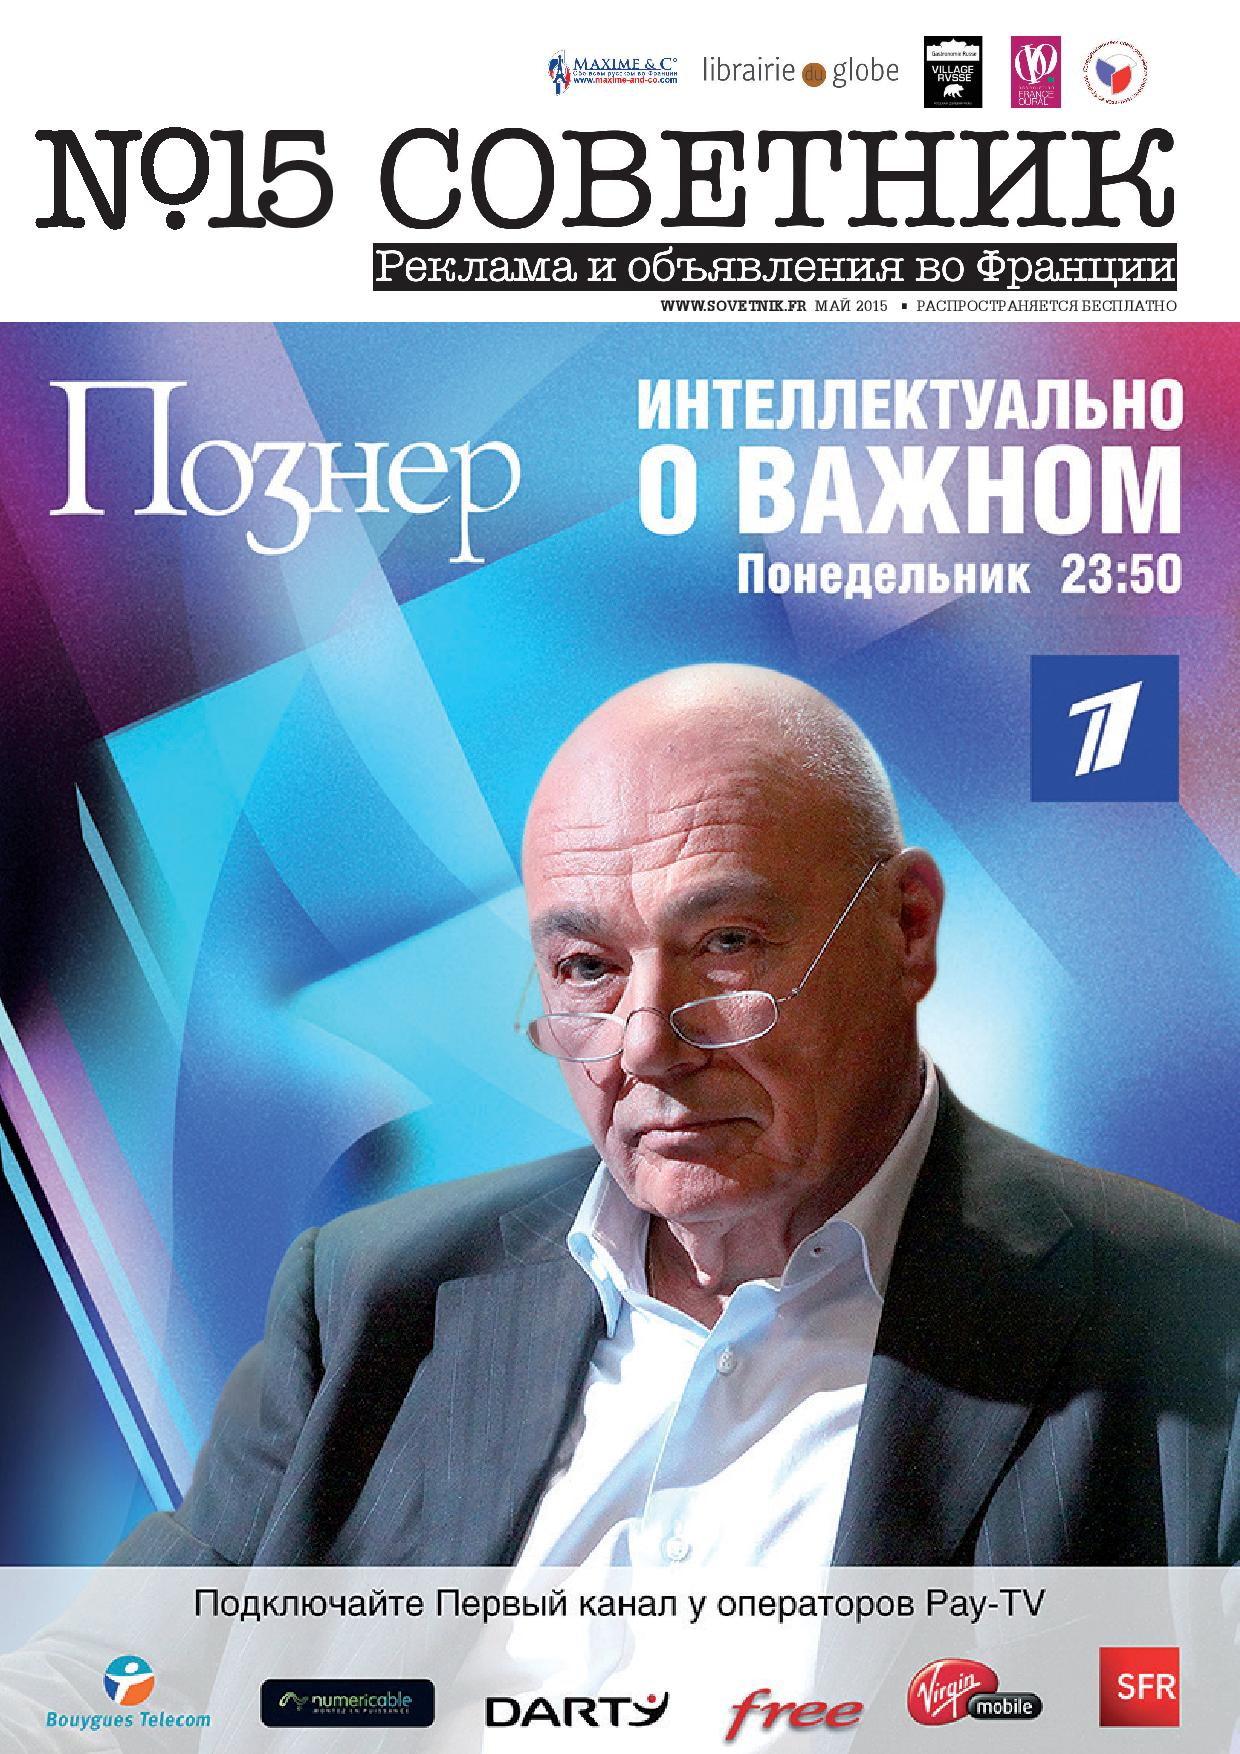 Советник, май 2015 (№15)